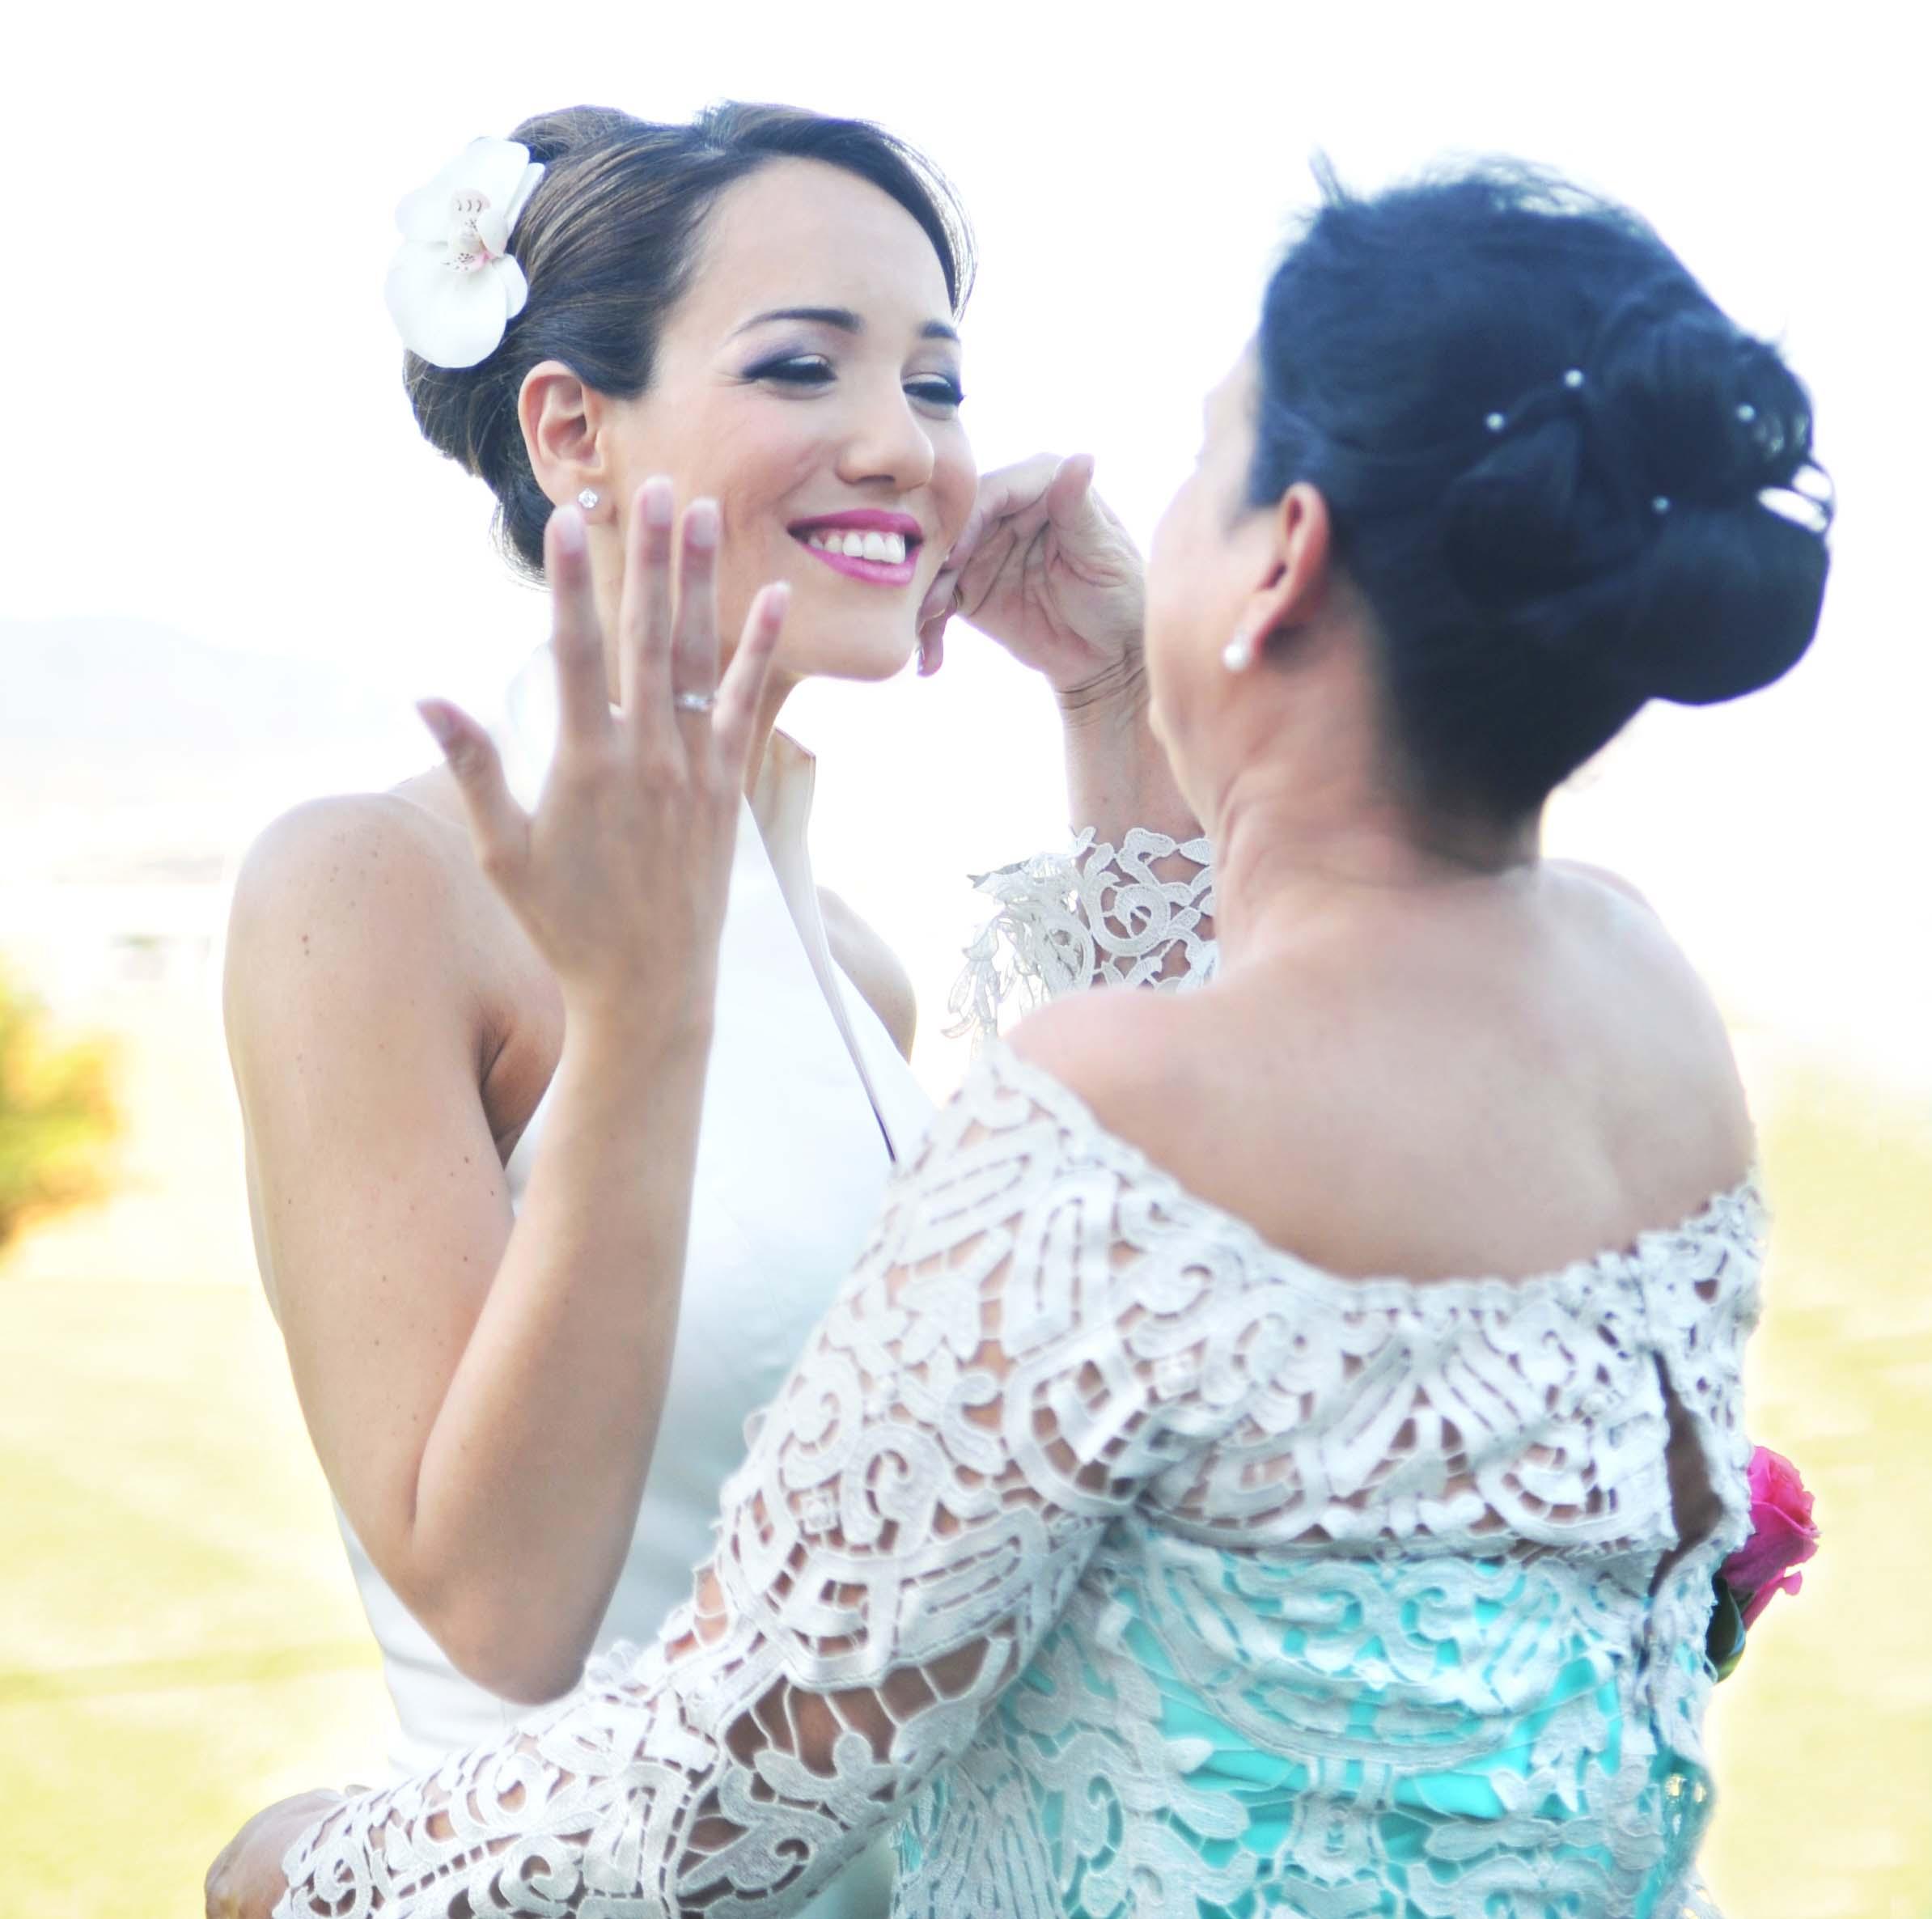 finca la tosca - fotografias de boda (13)